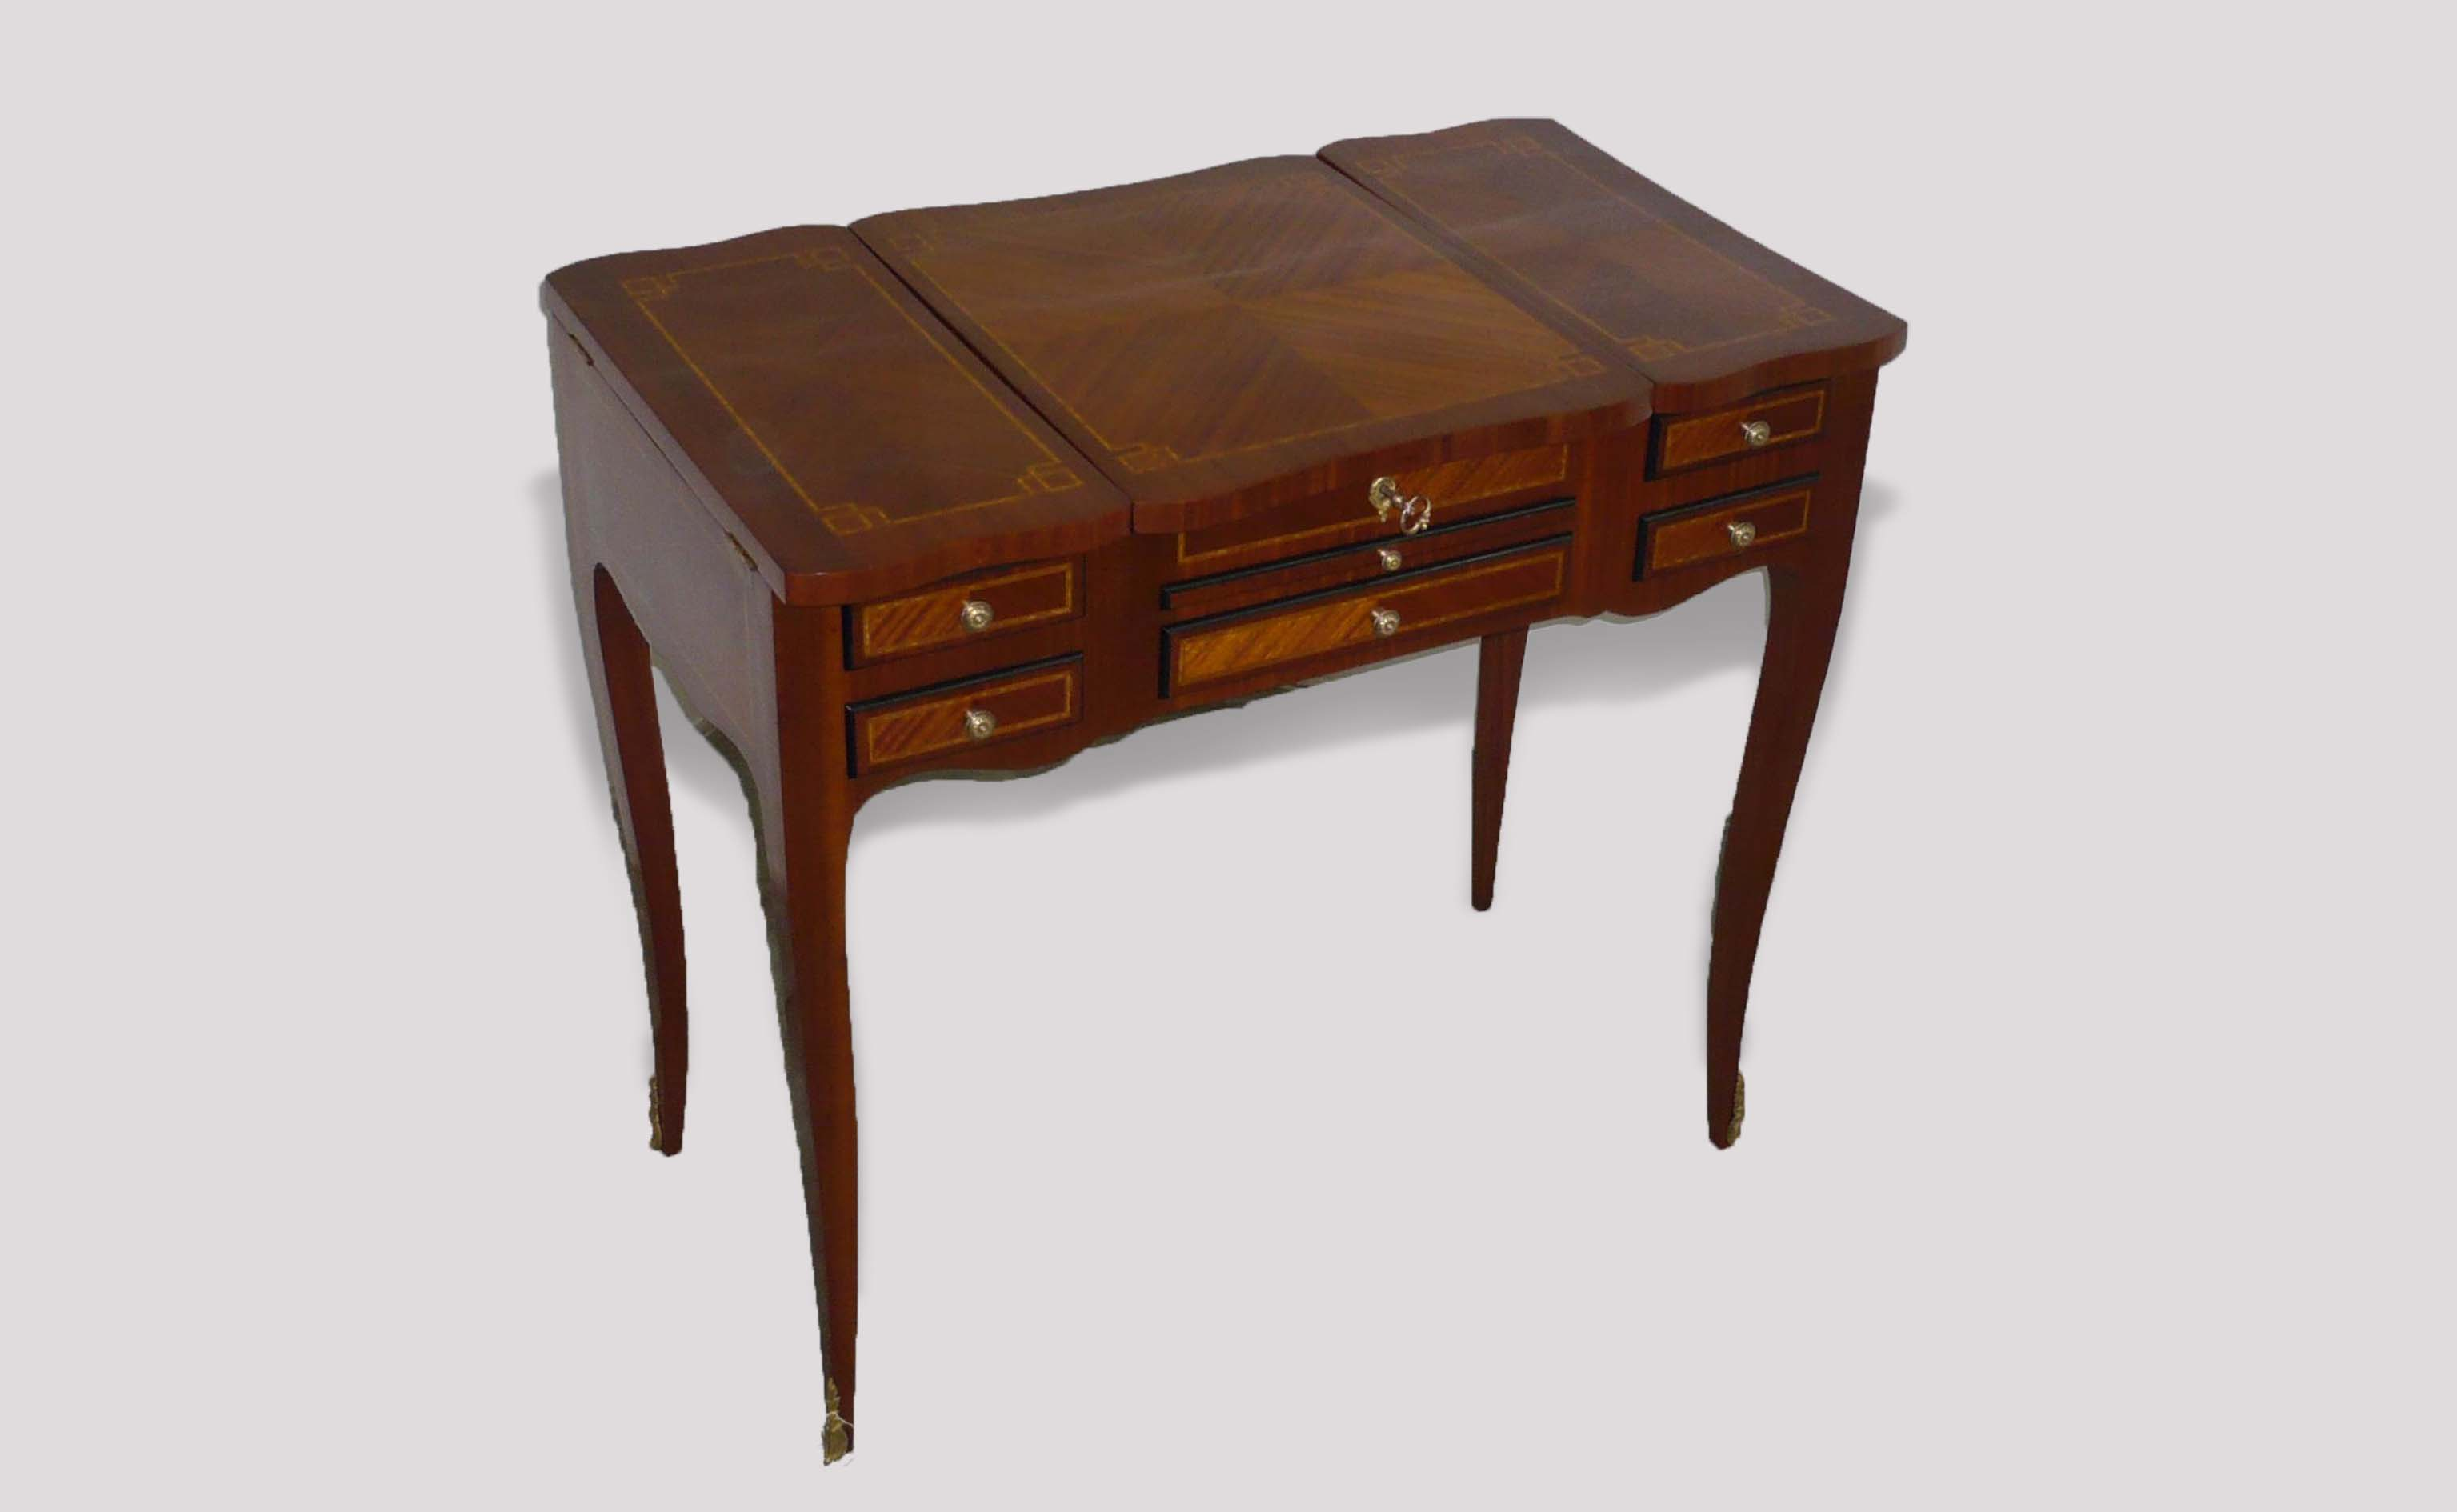 Destockage meuble ile de france nos r alisations for Destokage meuble